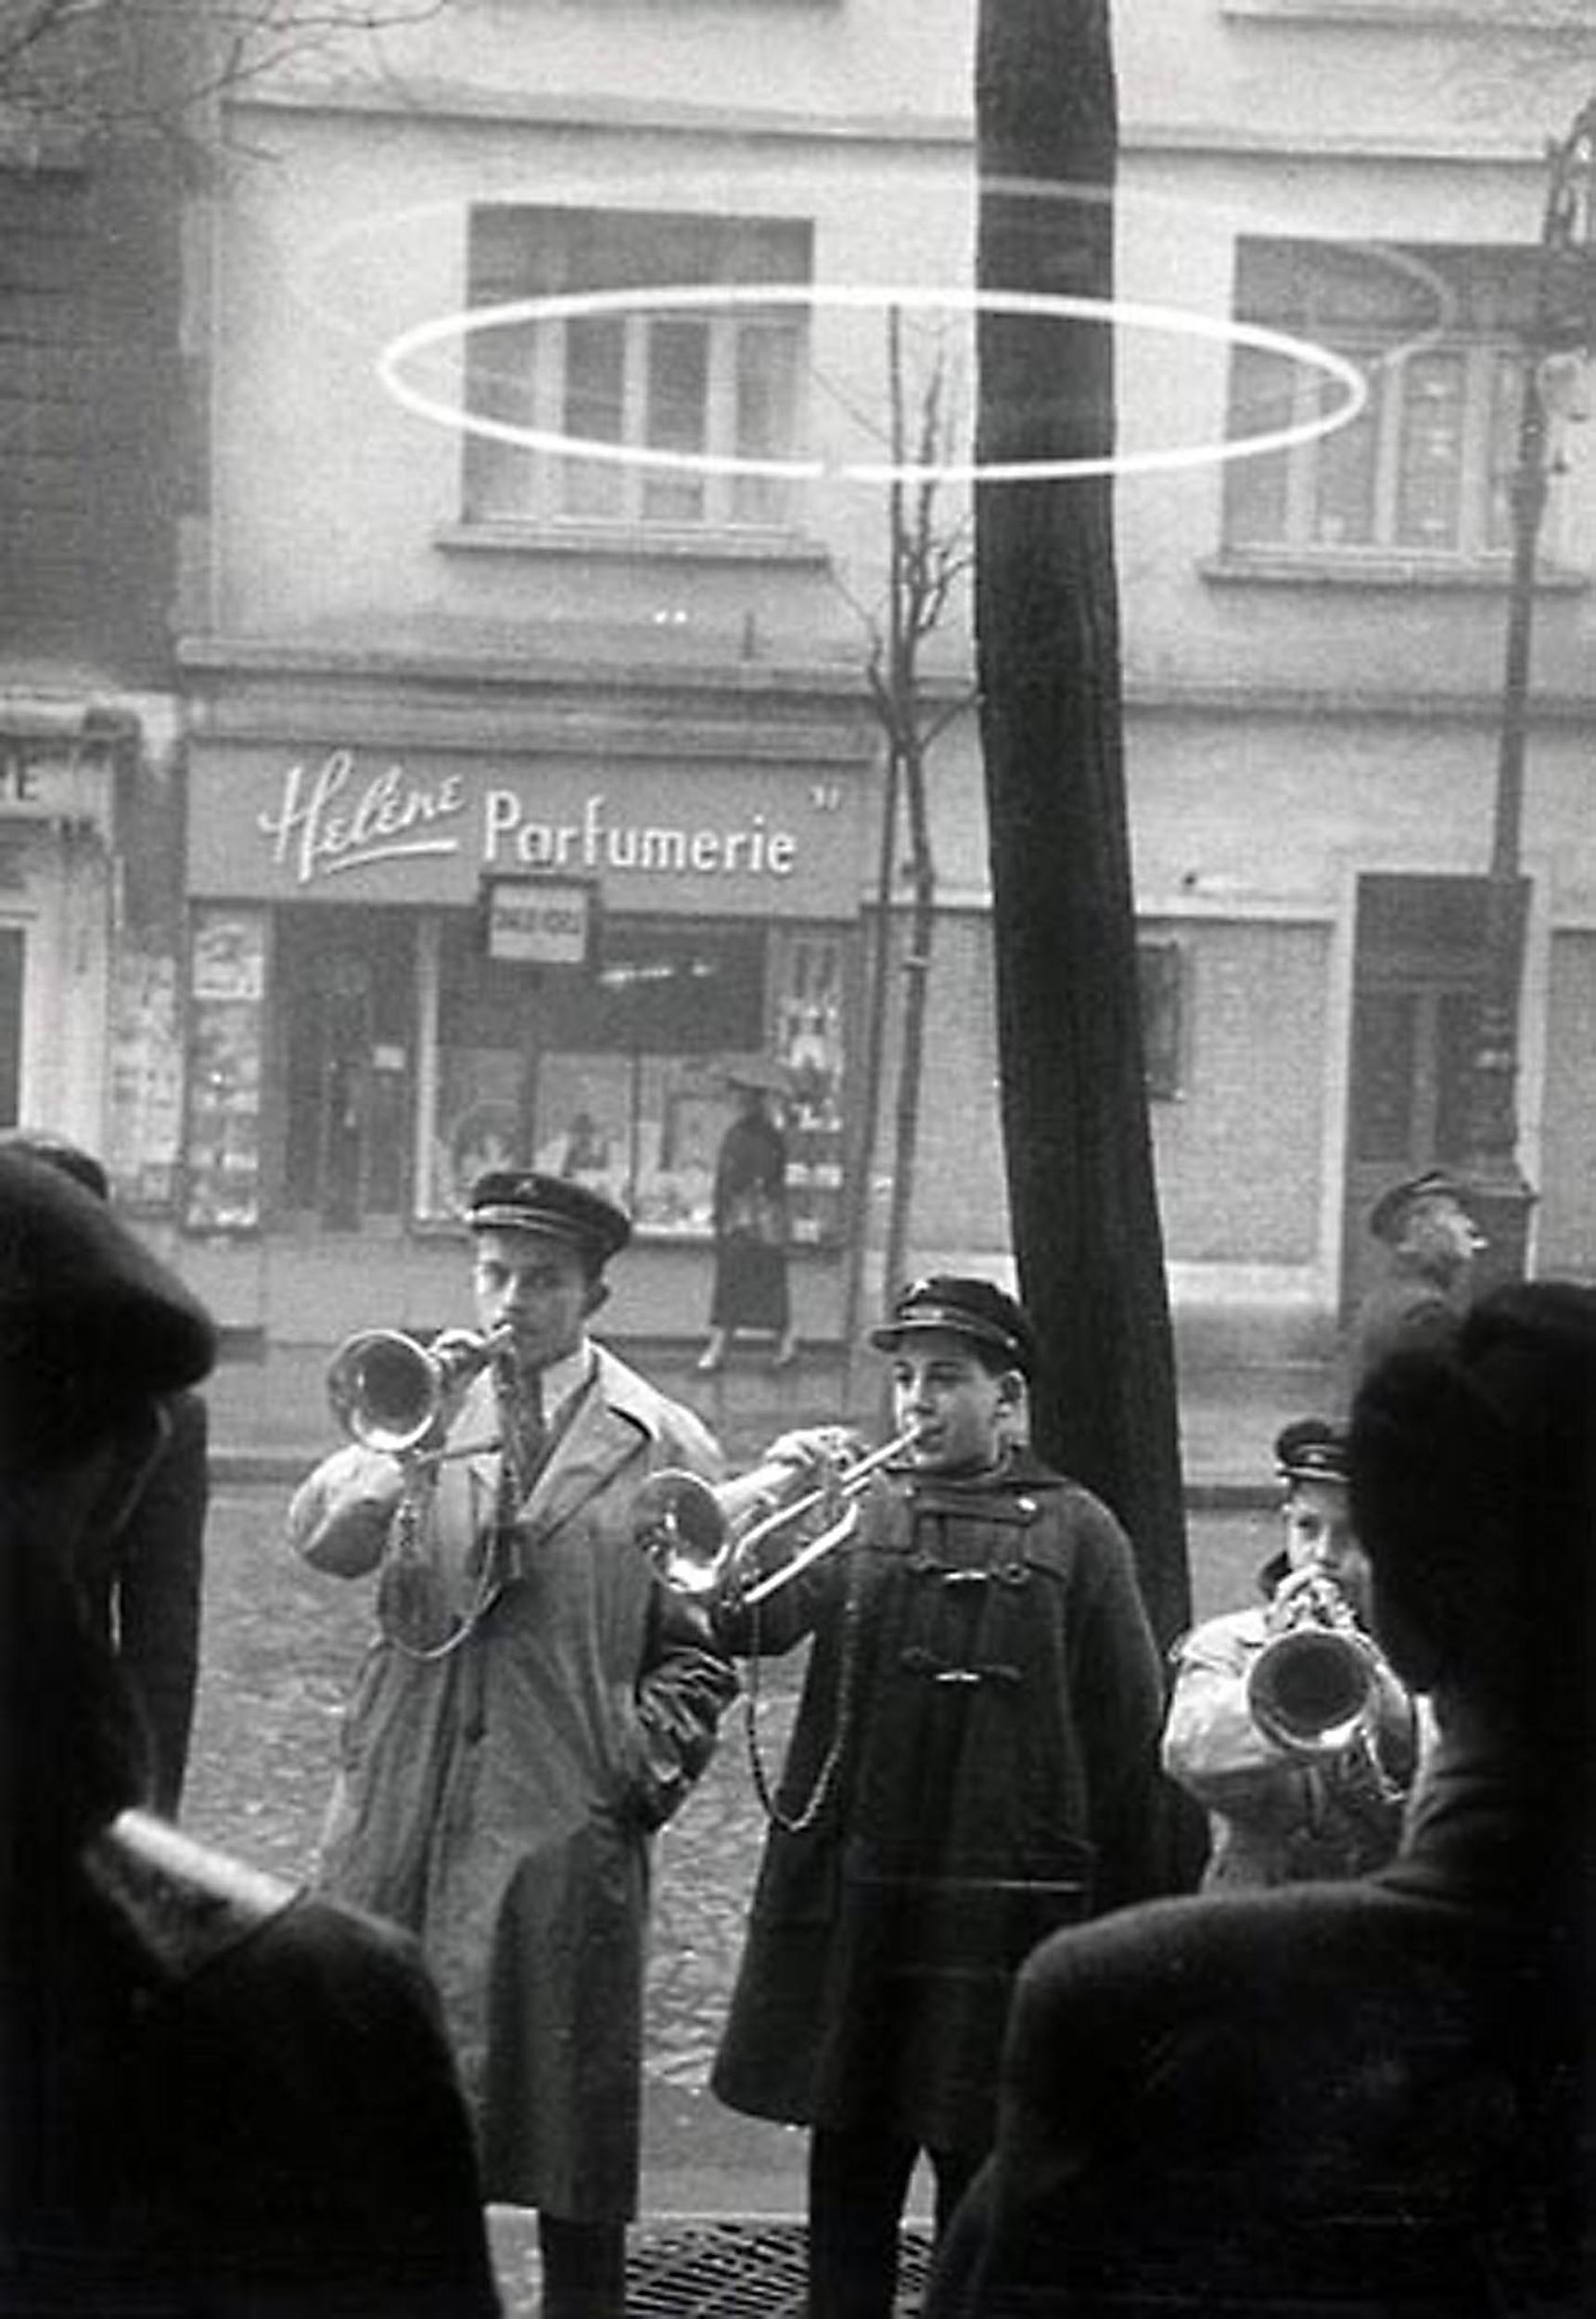 HANNON_salvation_army_saints_(paris)_1957_11x14_high.jpg